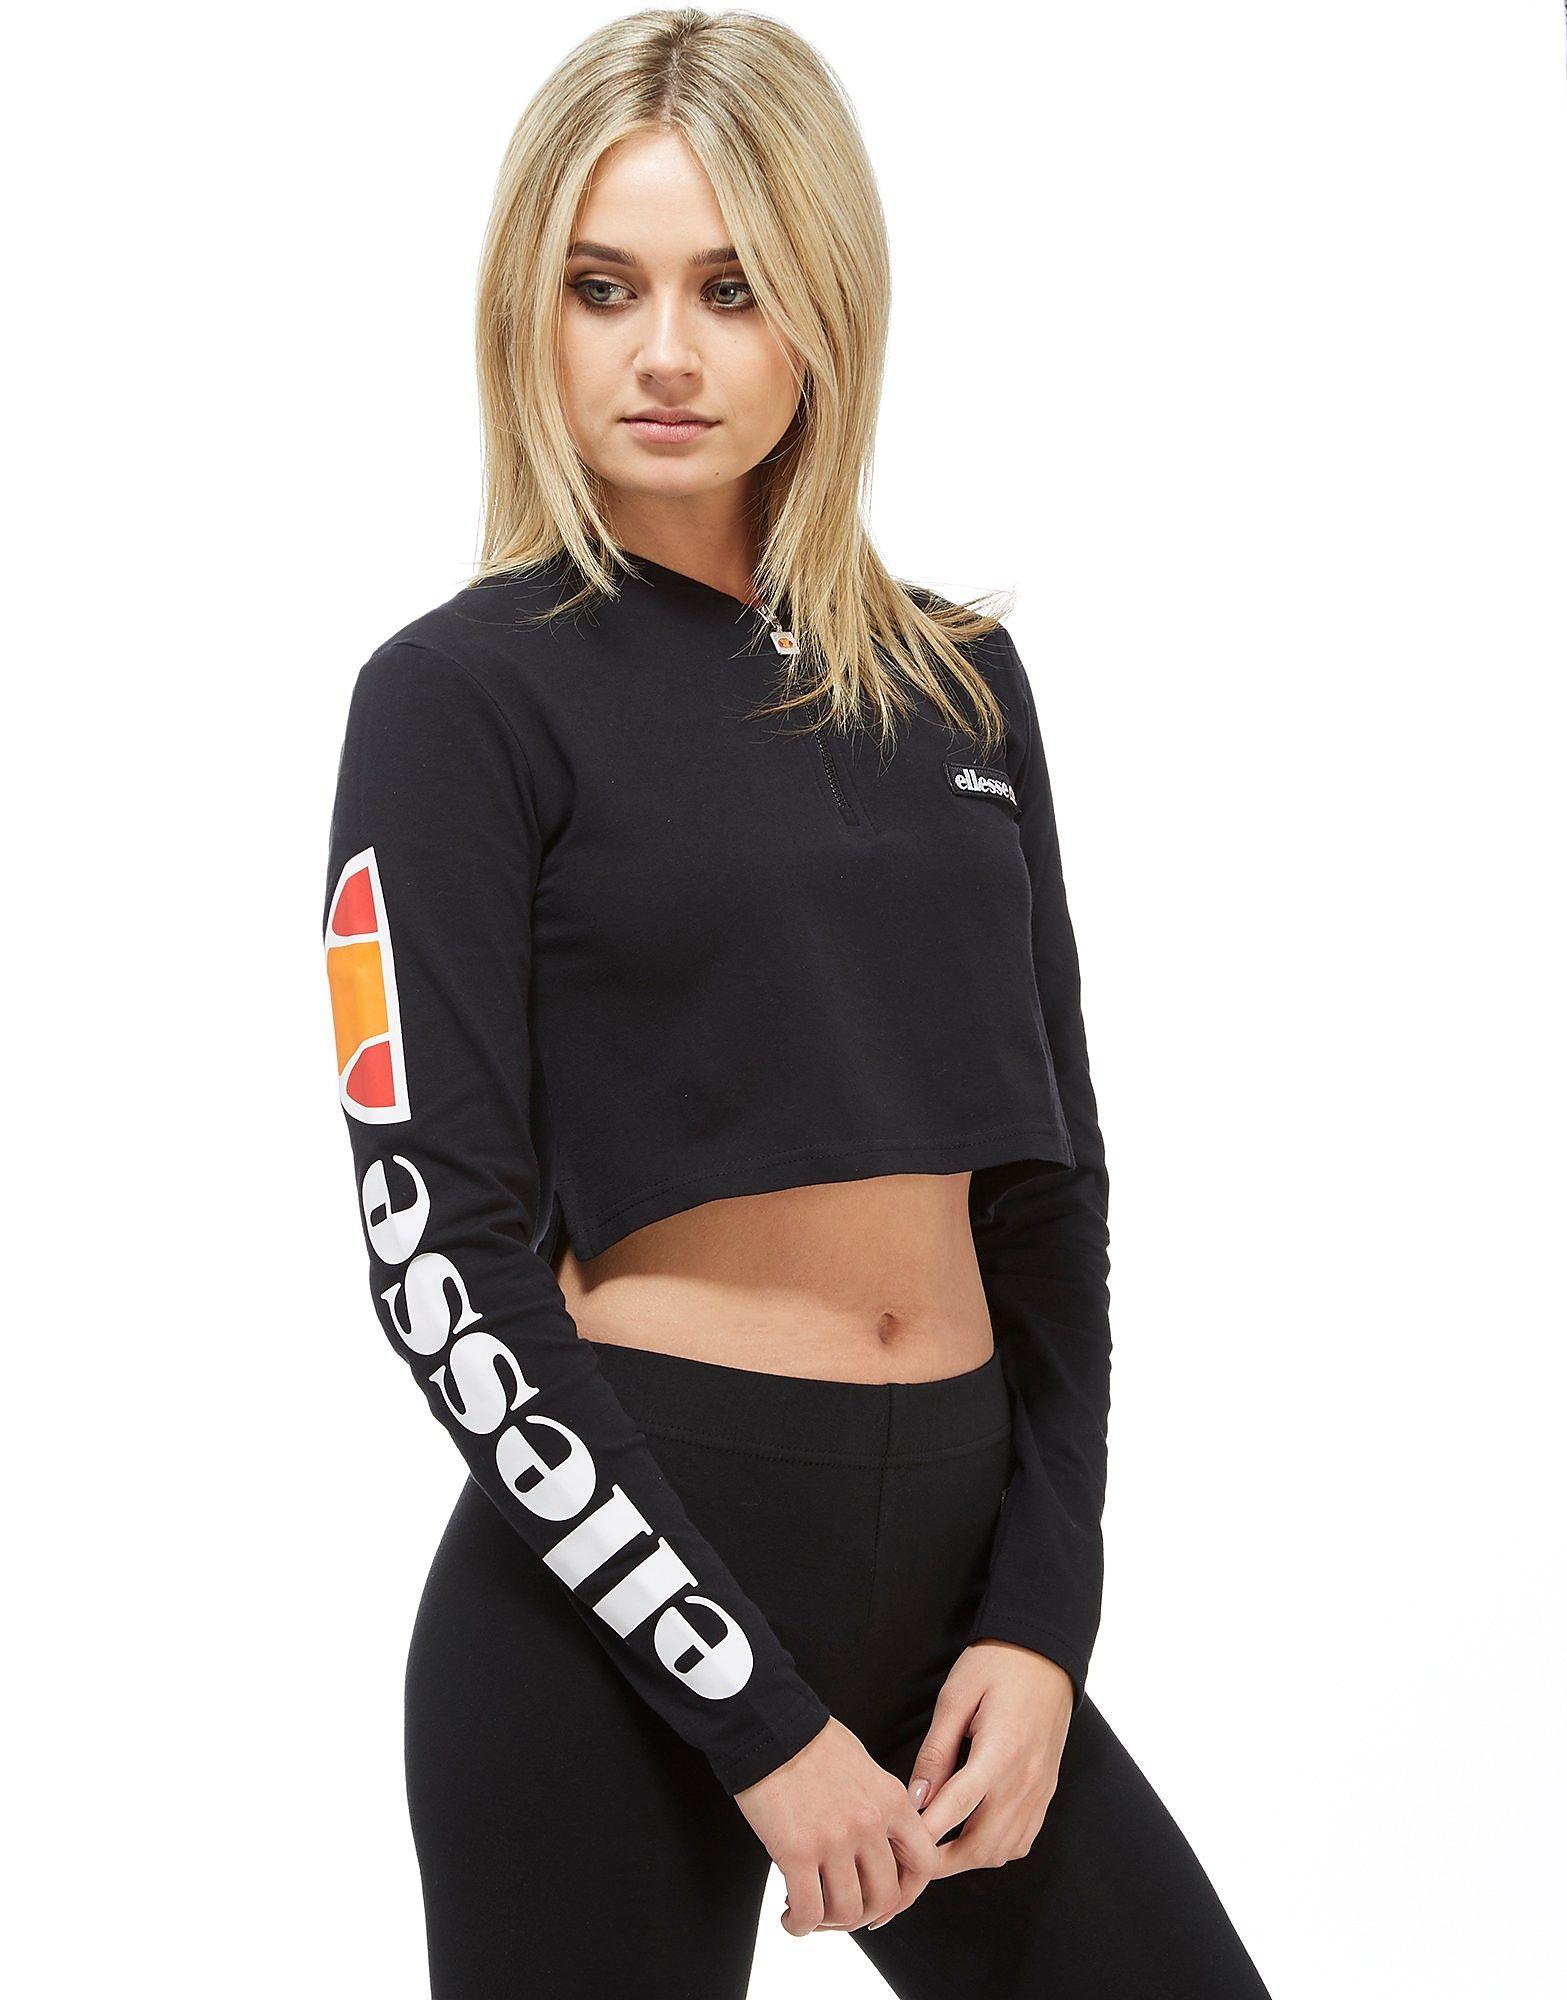 3acea89690 Ellesse Tape Long Sleeve T-Shirt in 2019 | Mode vêtements | Polo ...